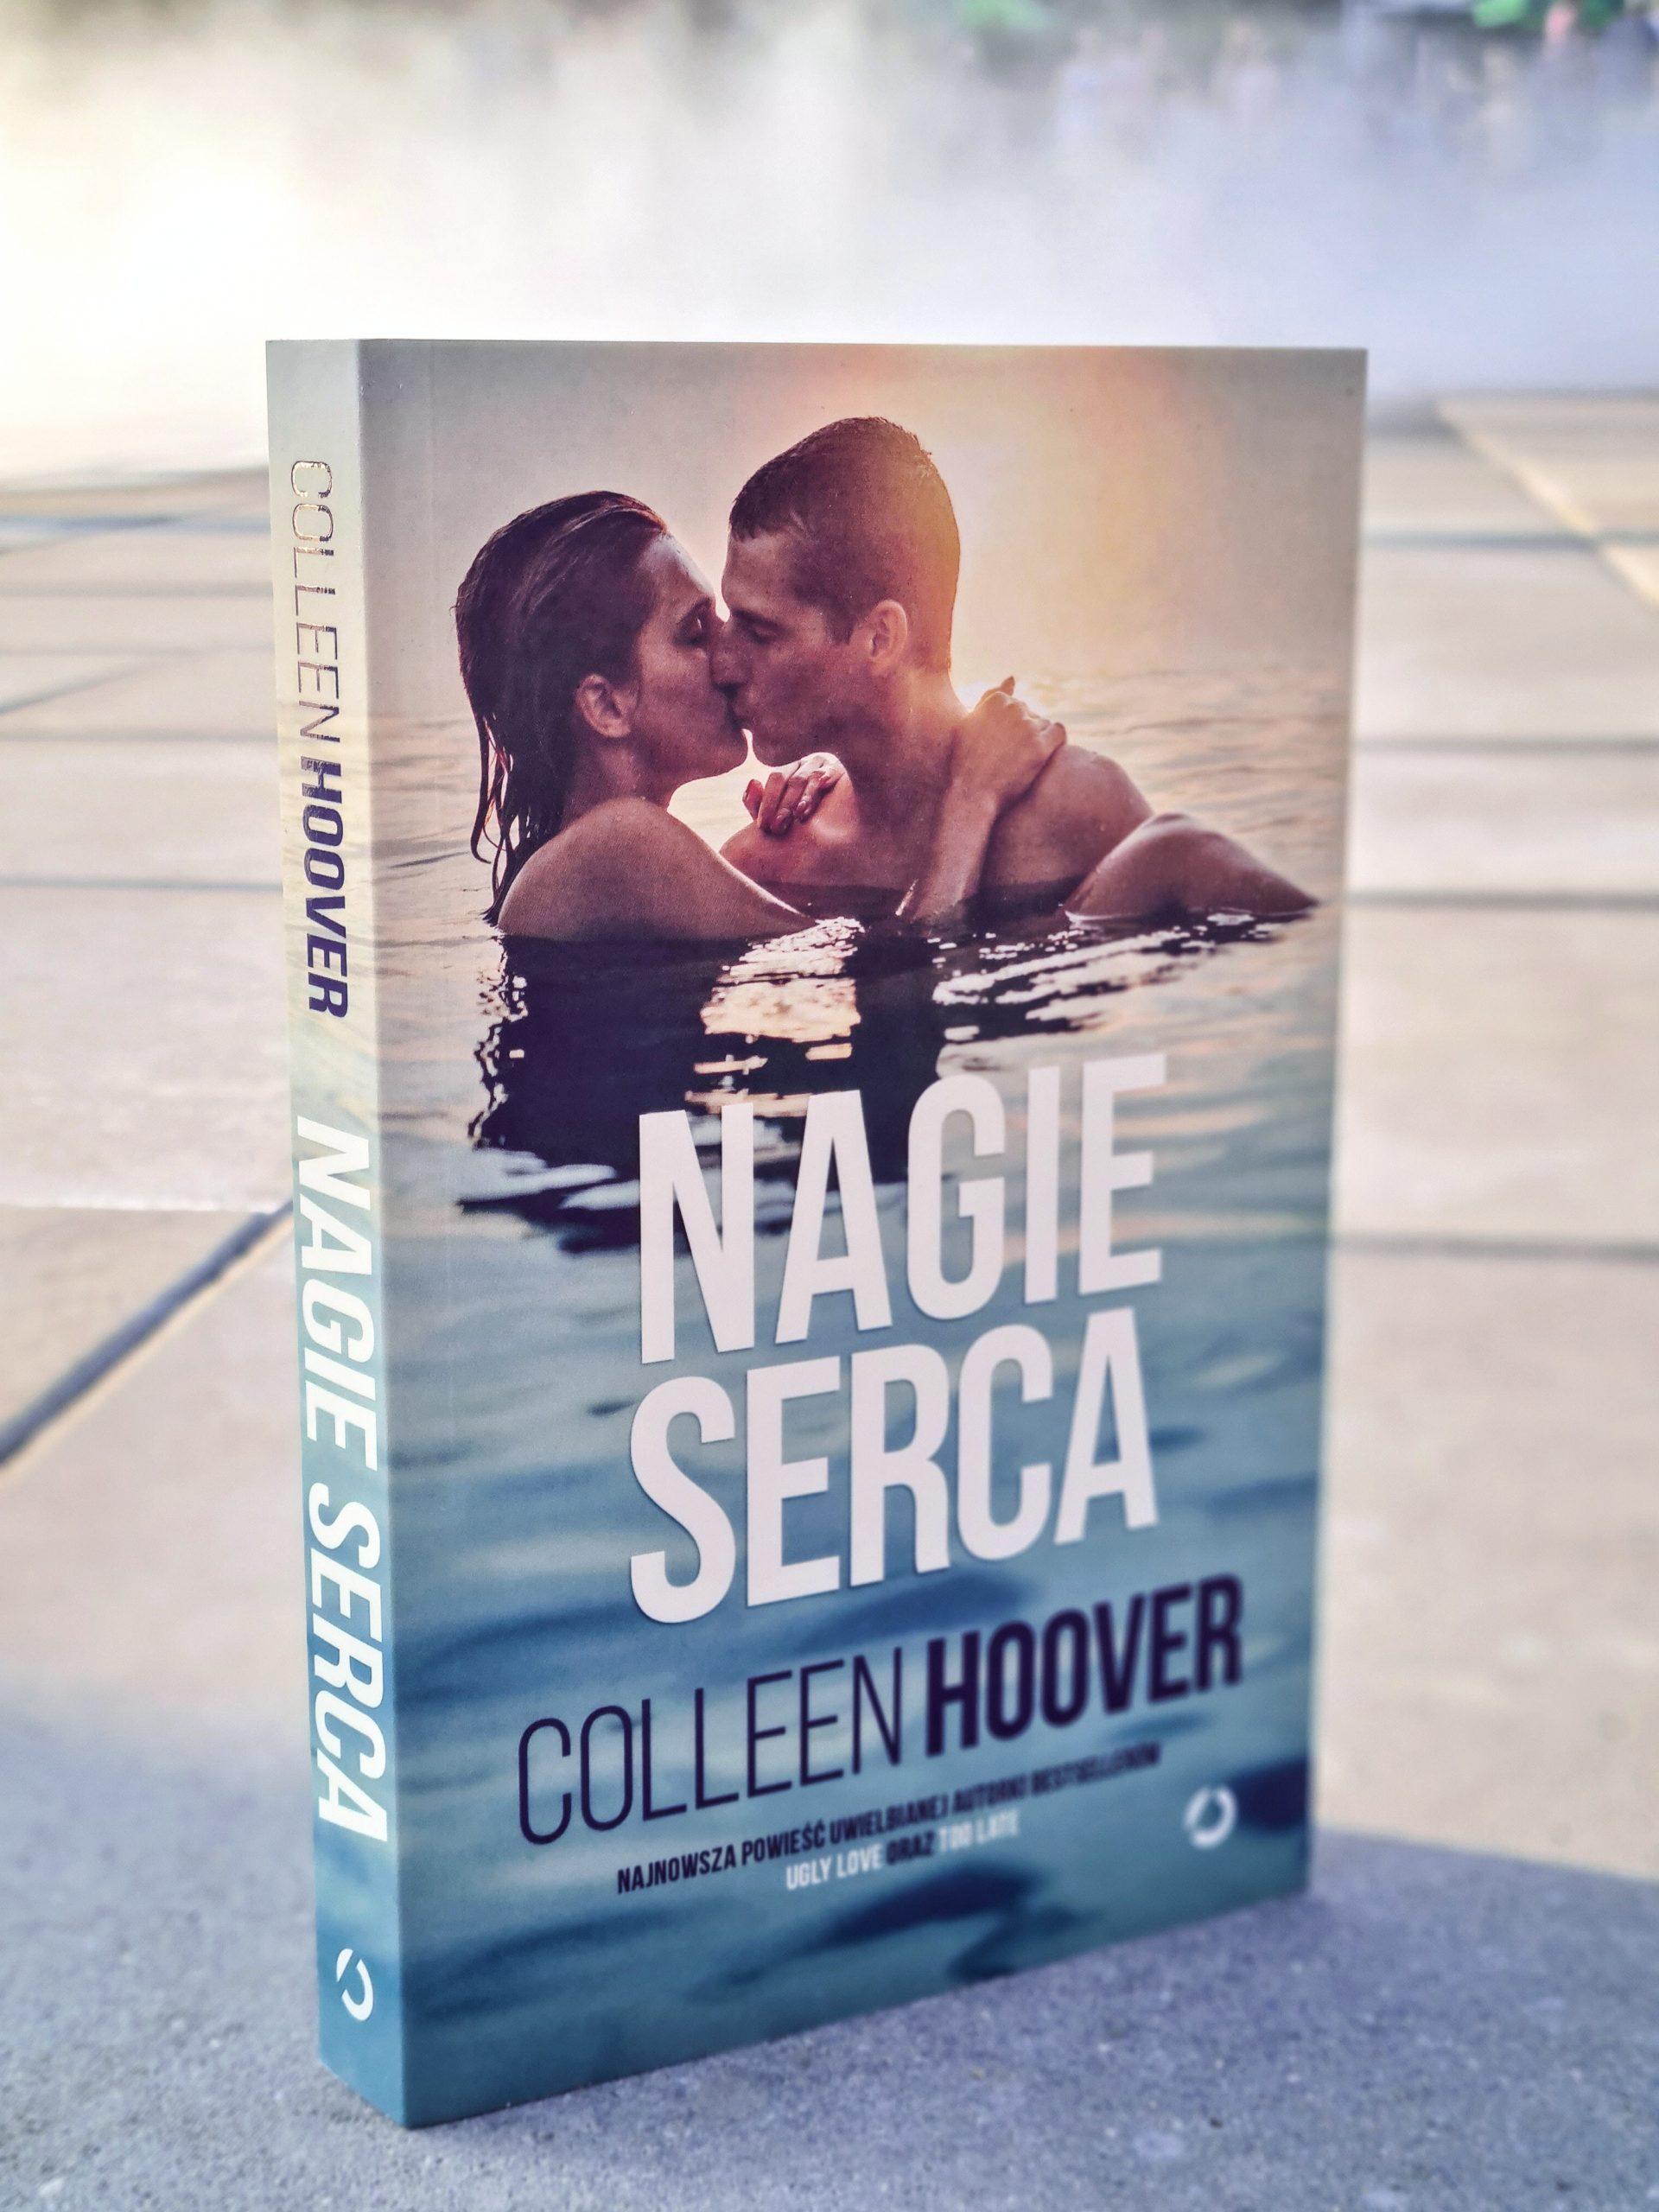 Nagie serca – Colleen Hoover